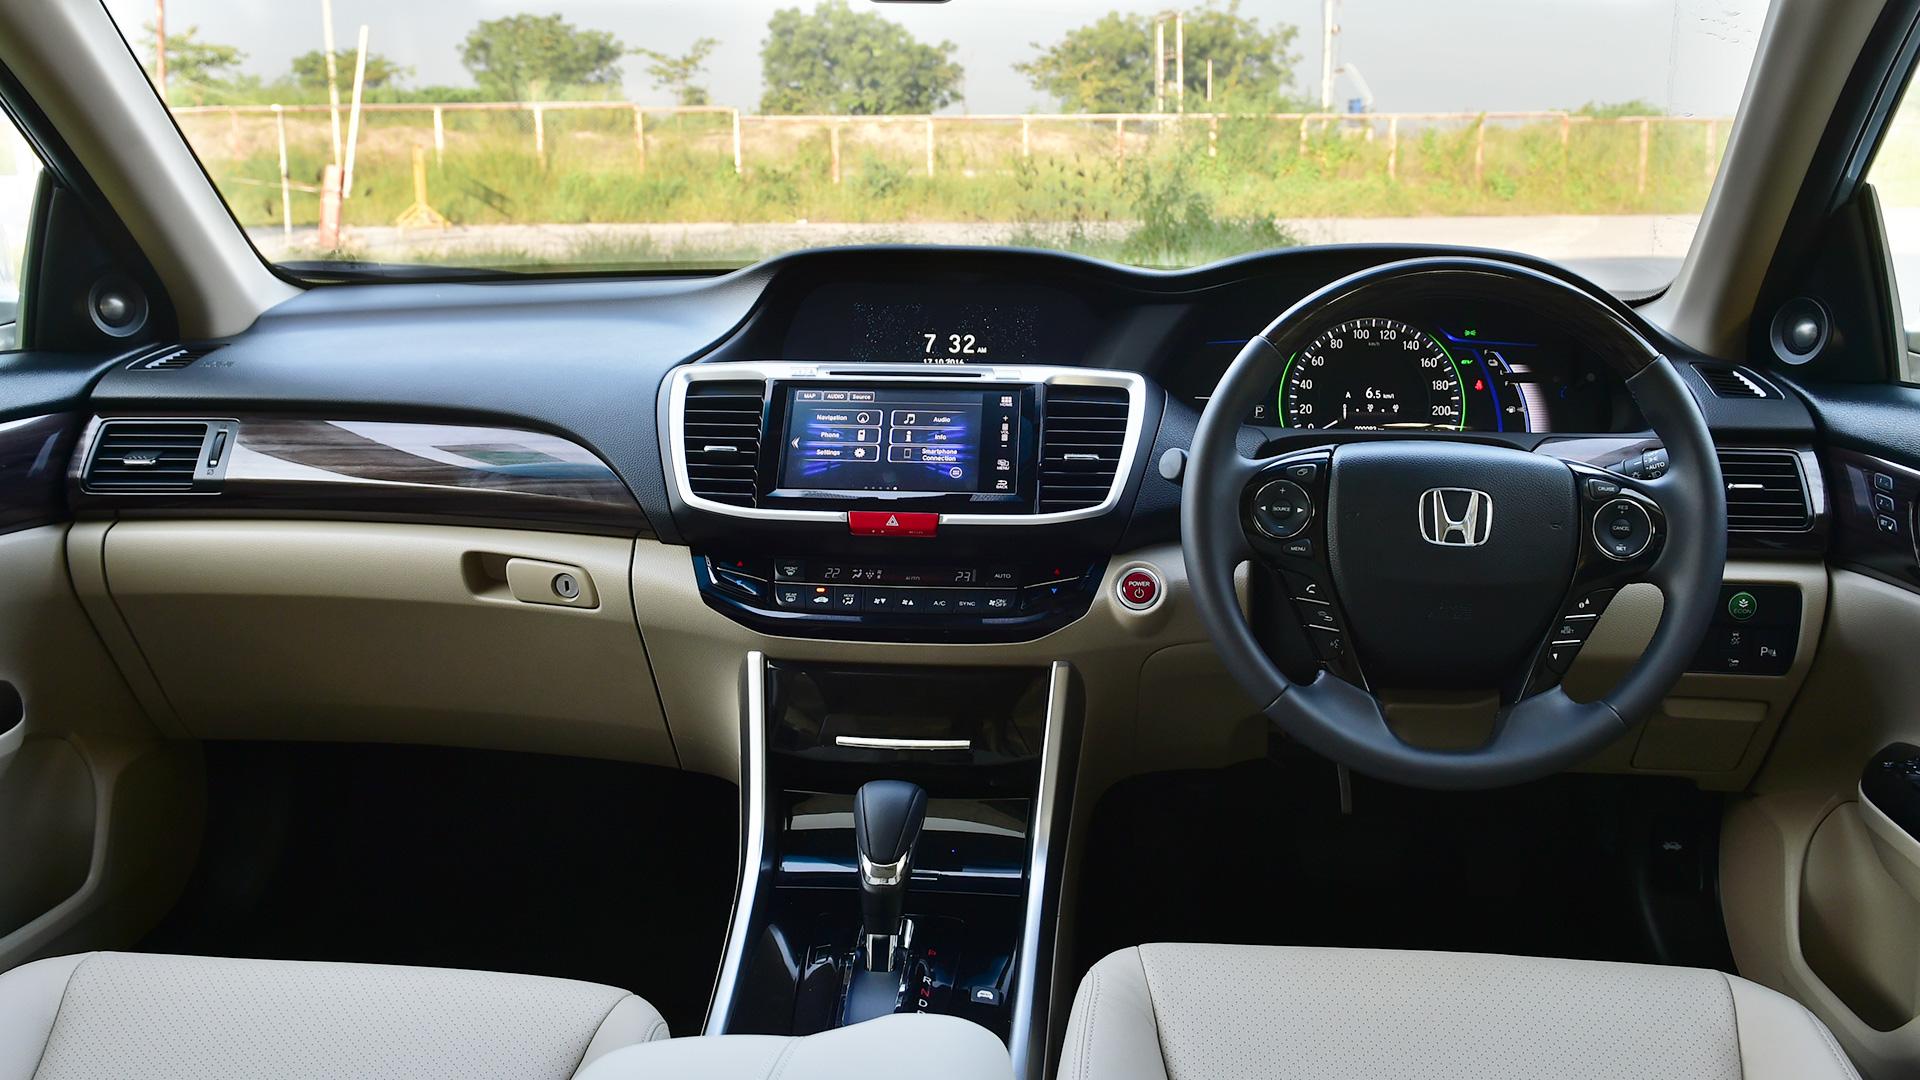 Honda Accord Hybrid 2016 STD Interior